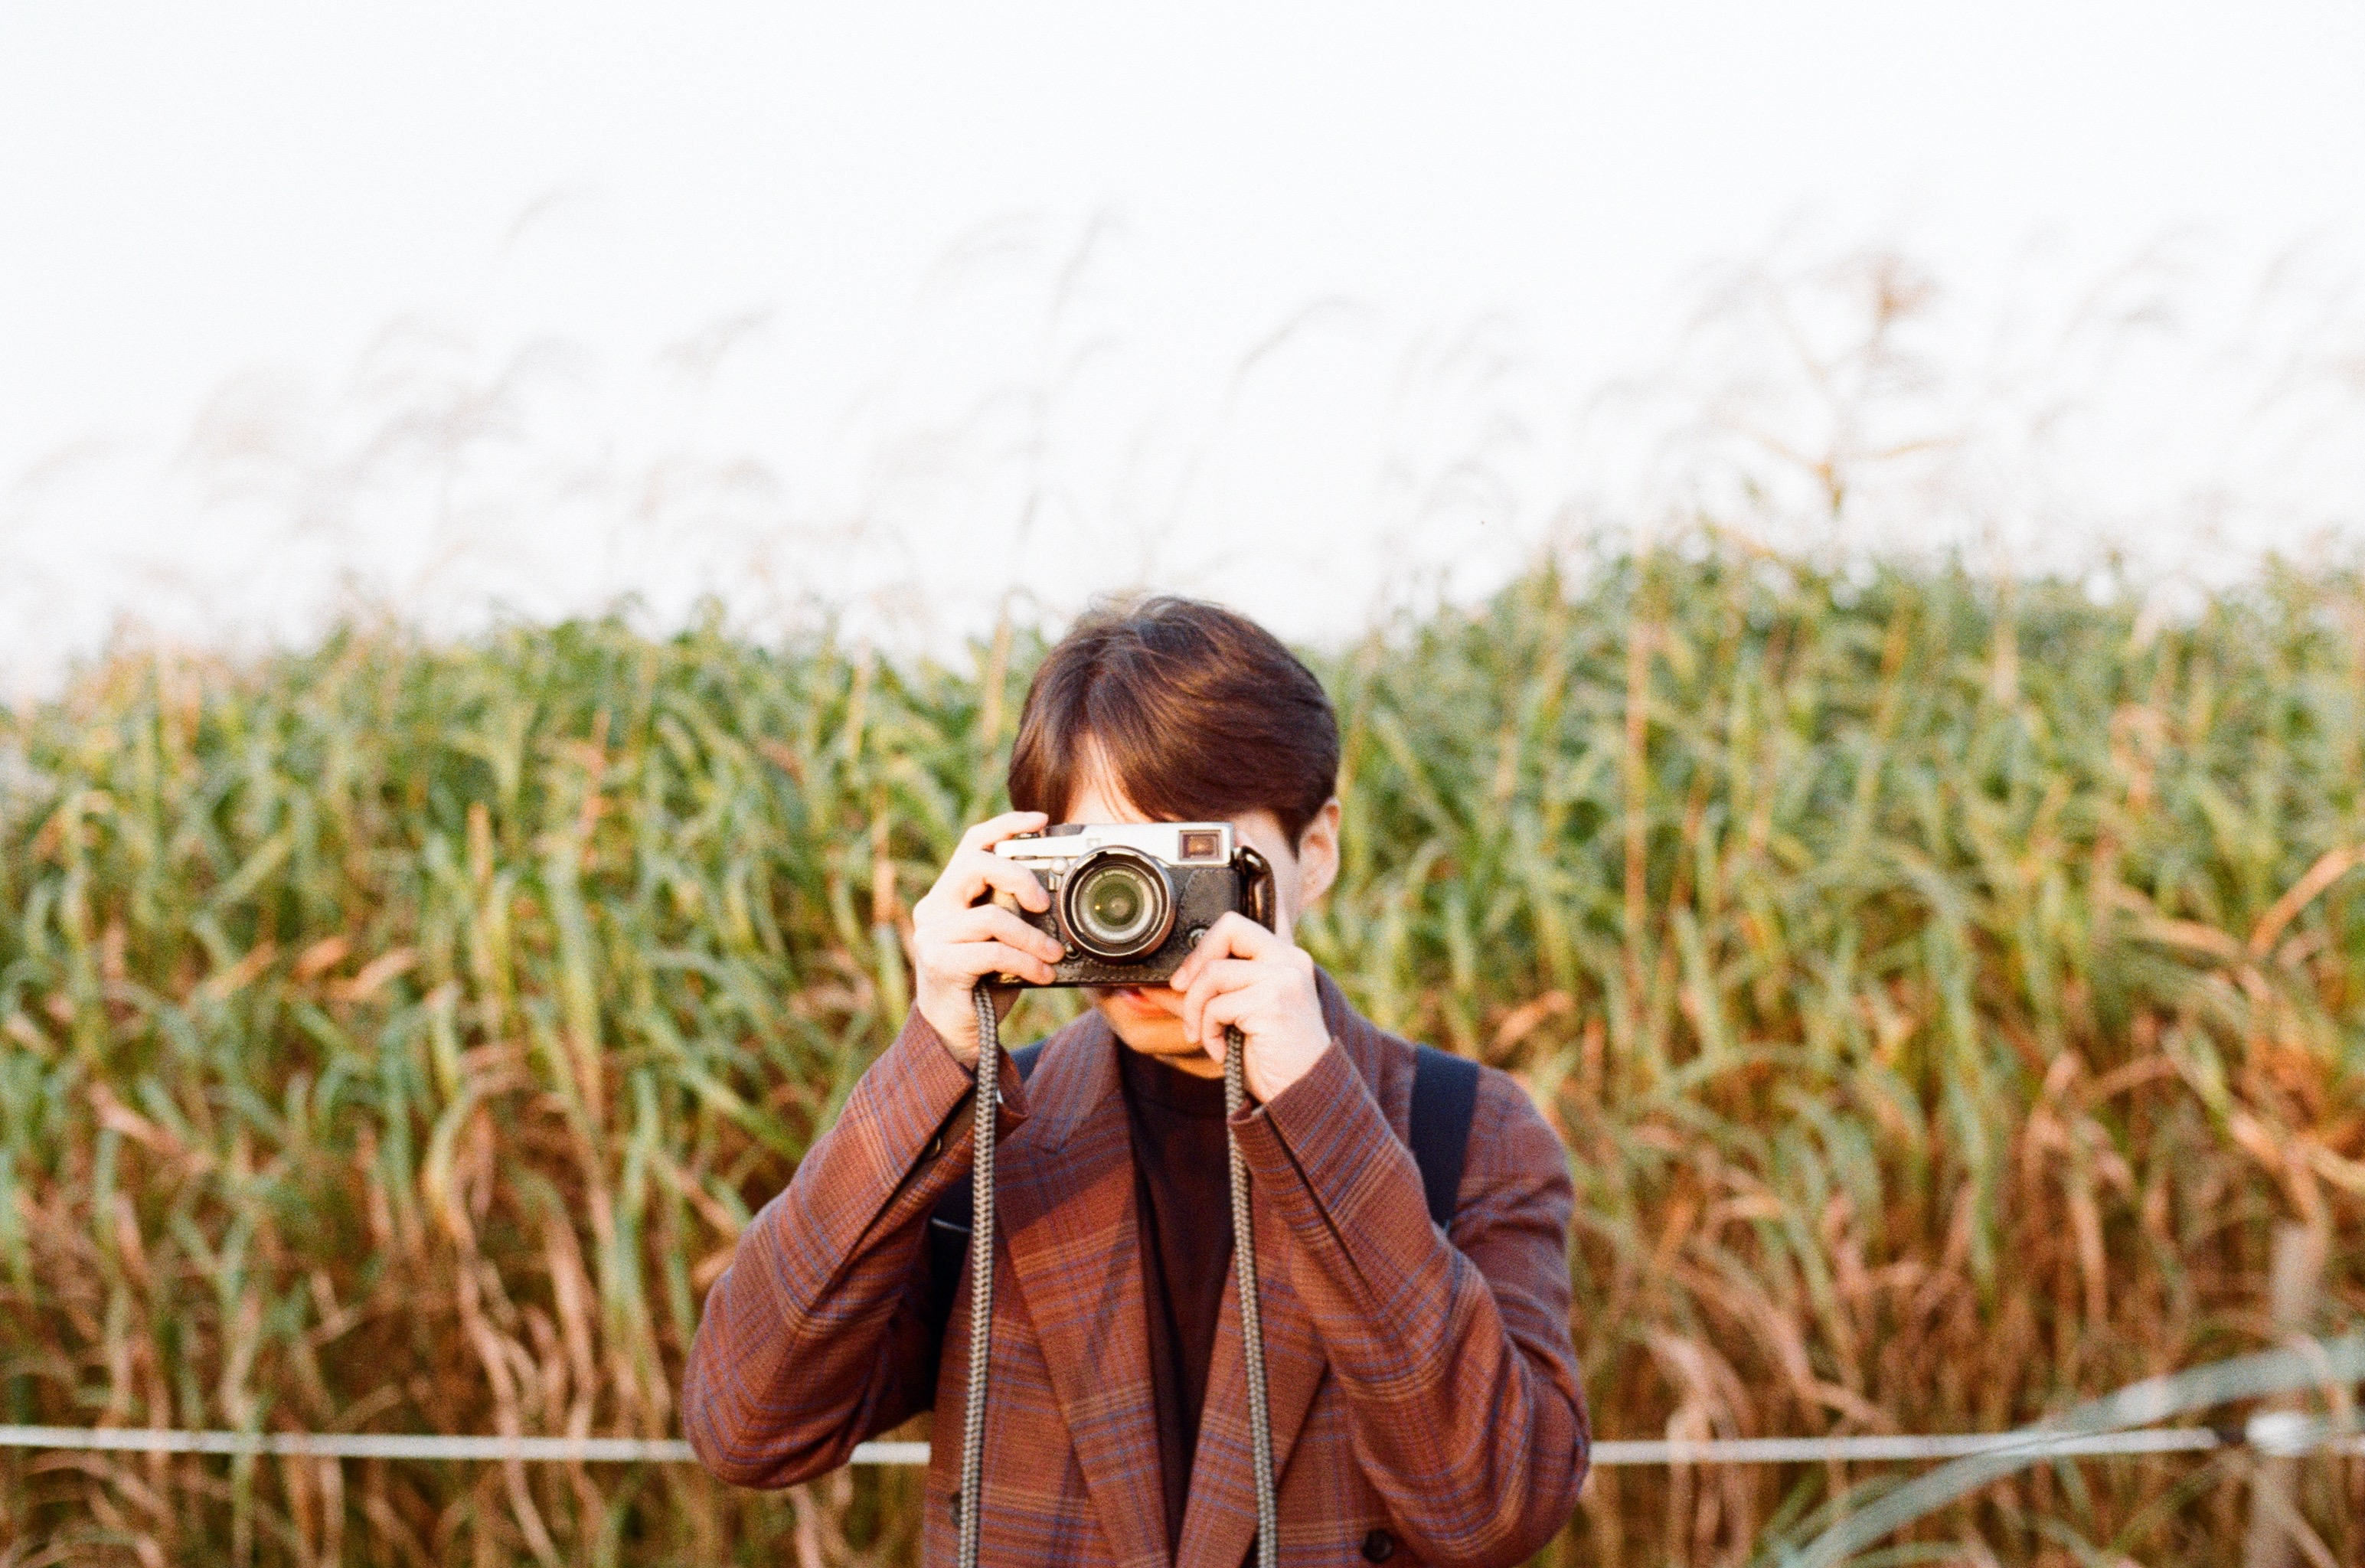 viewimage.php?no=24b0d769e1d32ca73feb87fa11d0283175f95a5bb5a9434fdc24c2adb34f4bdde46b42d20e42dd6e67a3a5a0db27858b856f6532c4141c42b01cc1bf6f1723ed570842af3da1bca0c9f6a241c2287a220808a81928f62bc95bf8b007200523a18f9582f2d761182005a014